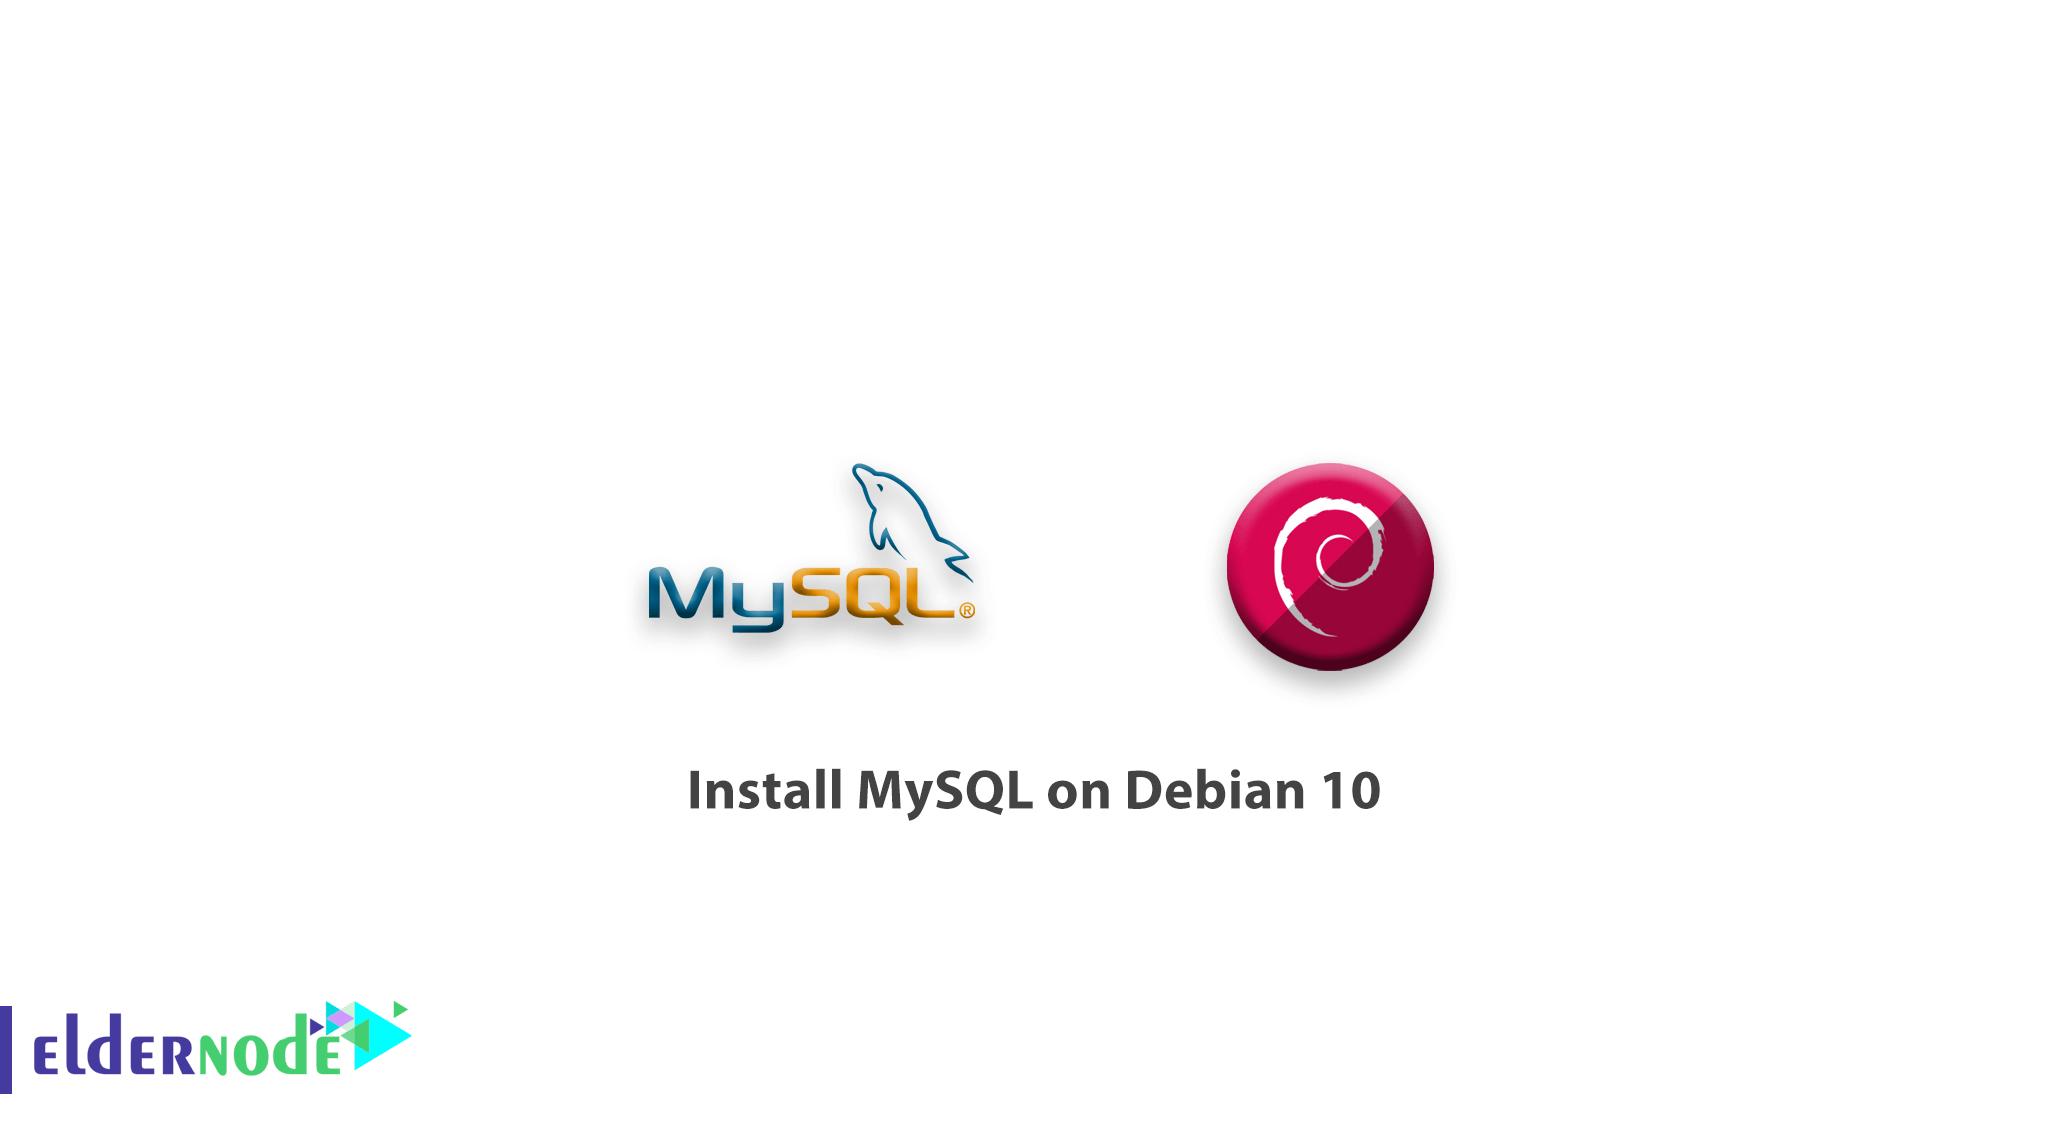 How to install MySQL on Debian 10